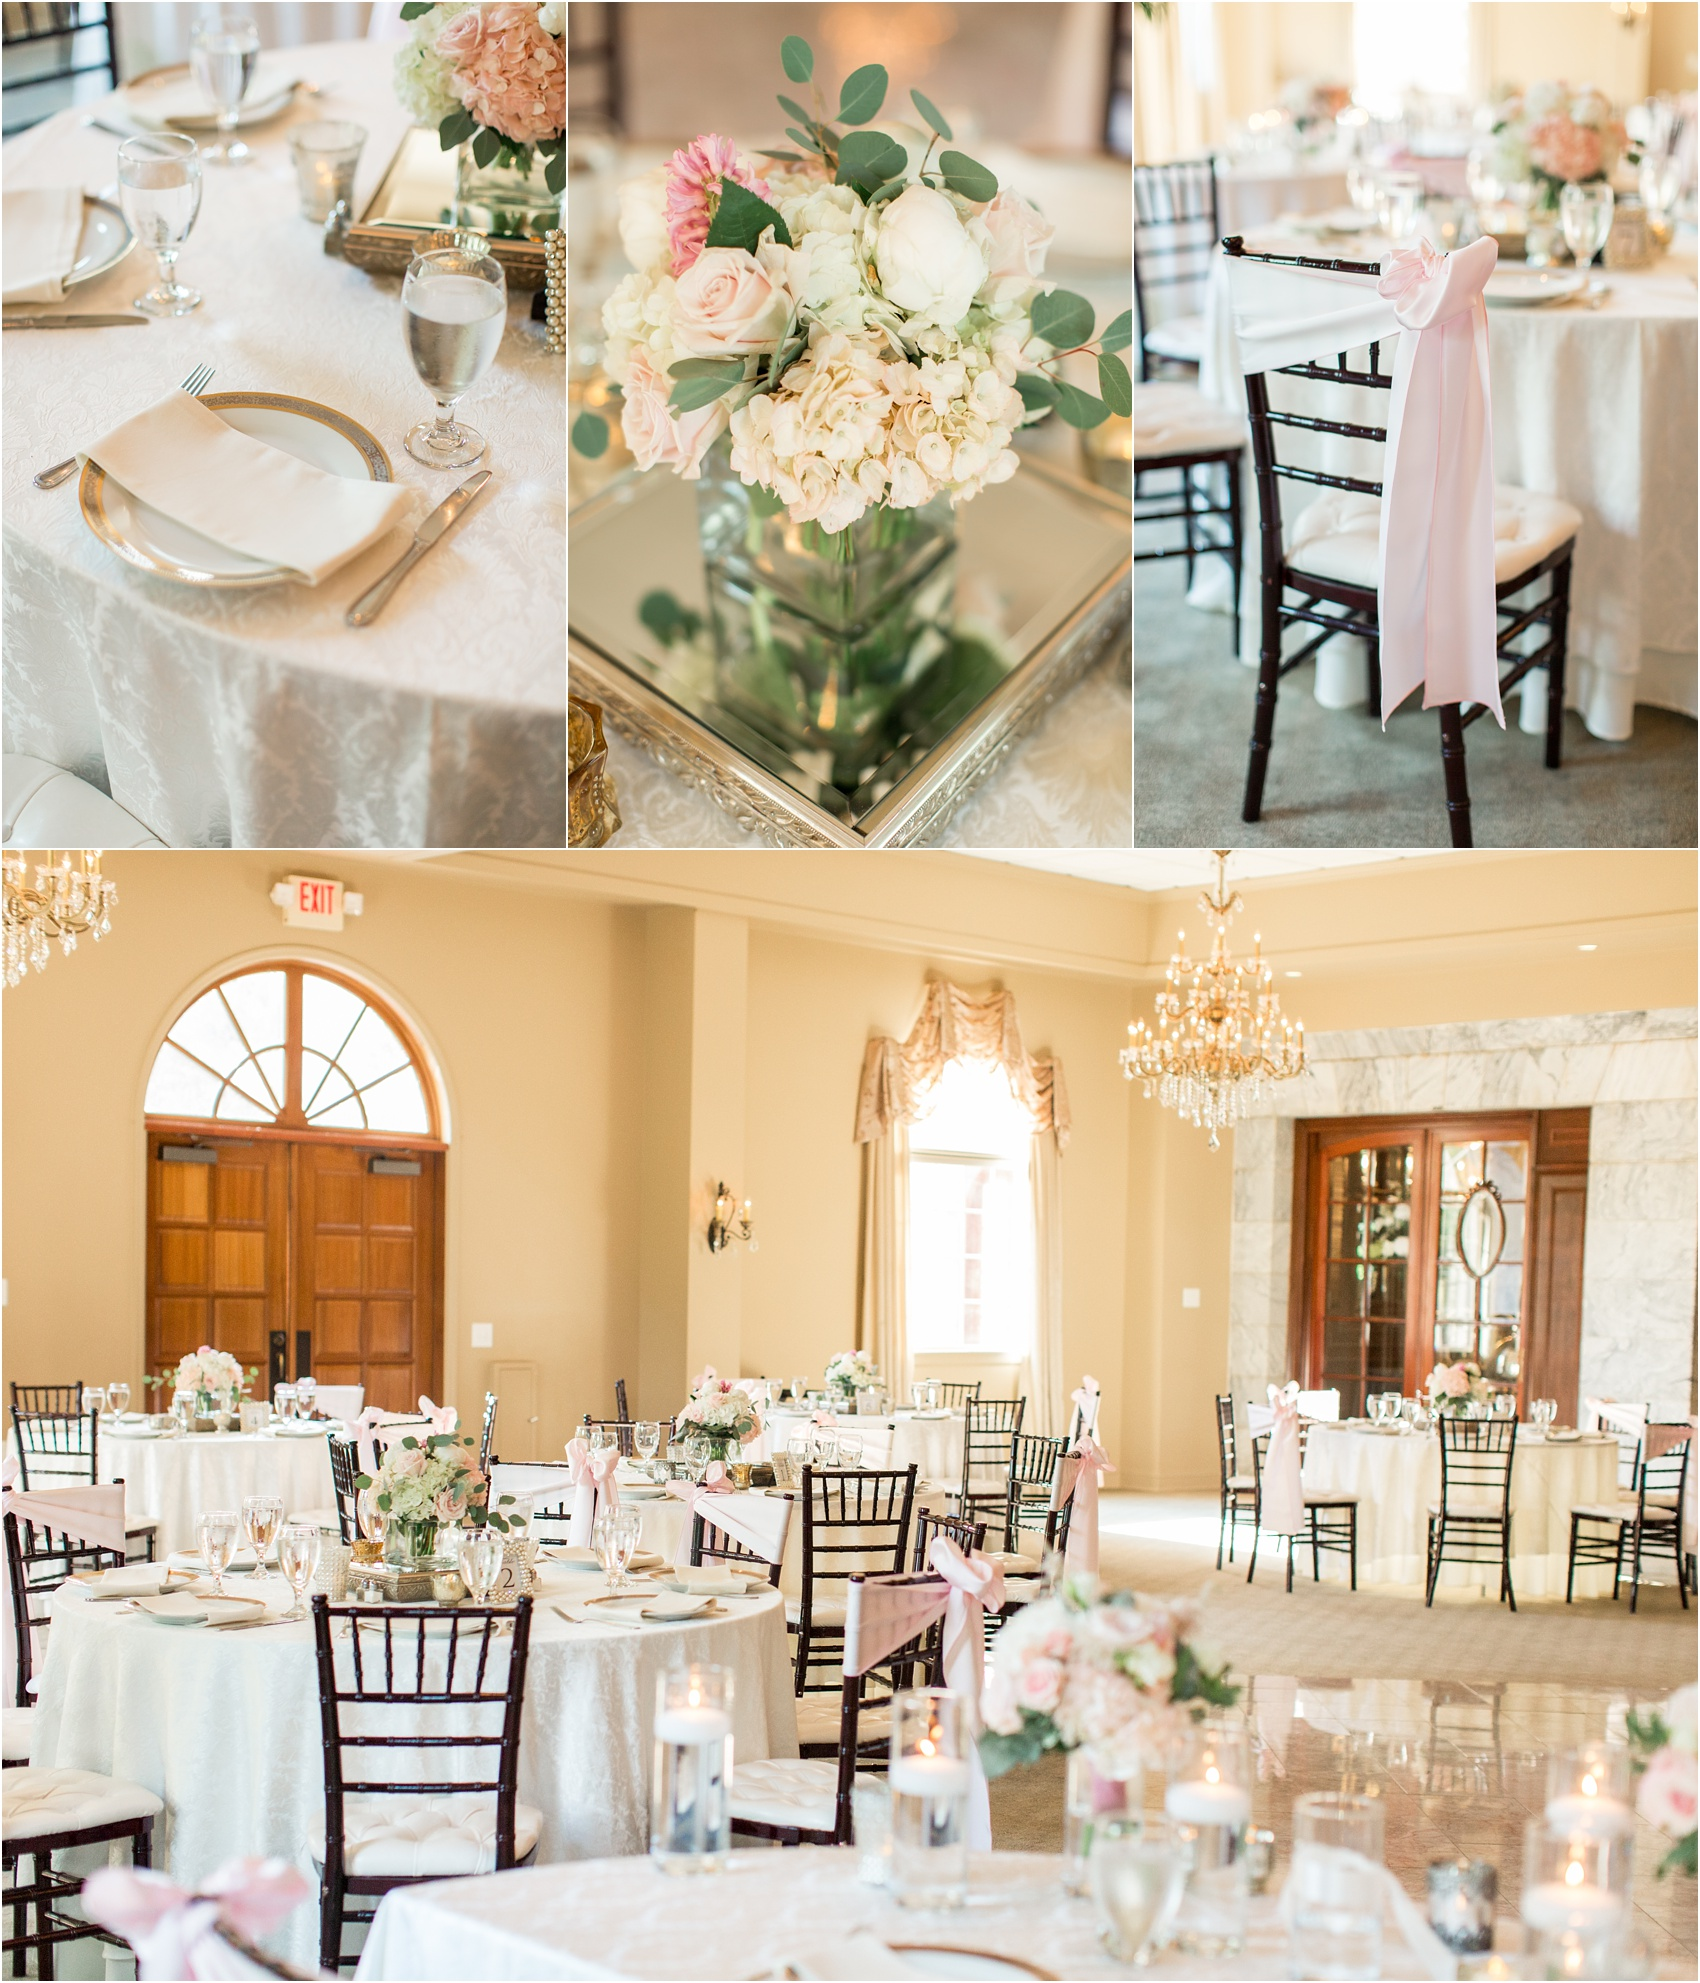 Savannah Eve Photography- Nutt Wedding- Blog-90.jpg